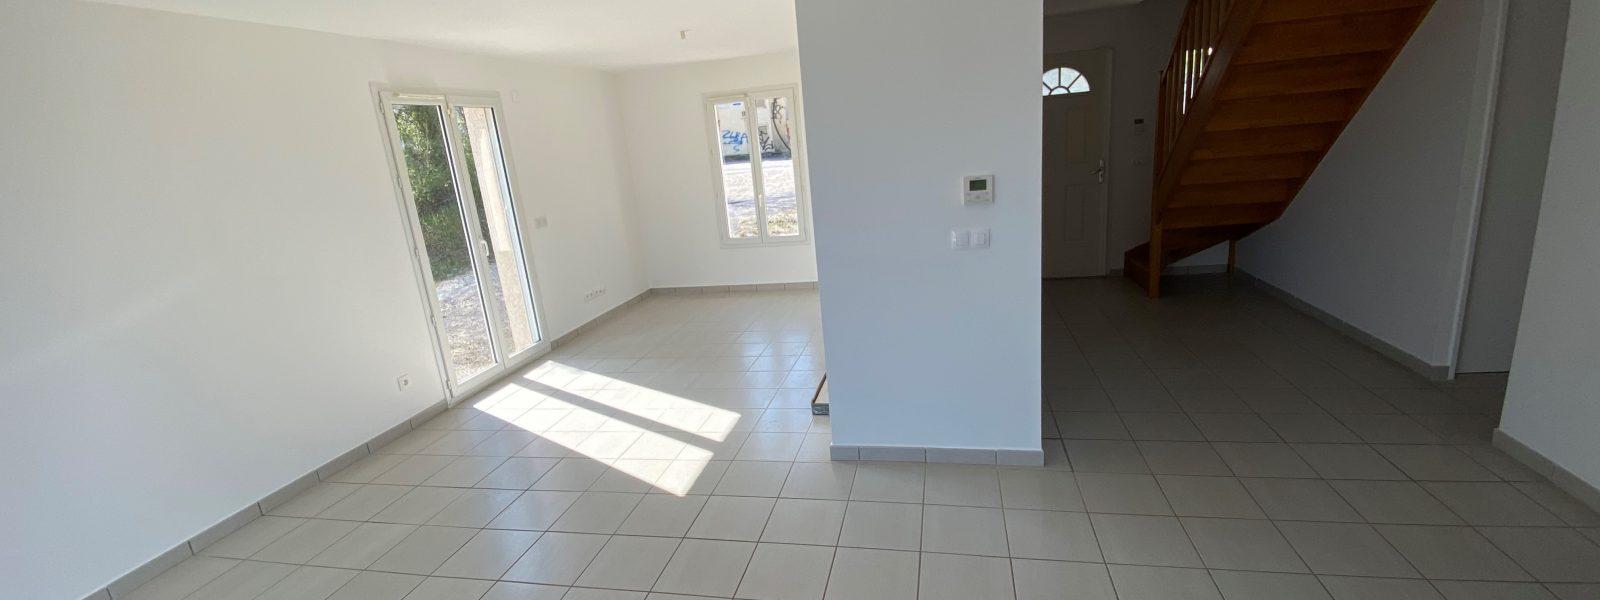 64 RUE DES MALADIERES - Visuel 2 - Impact immobilier 01